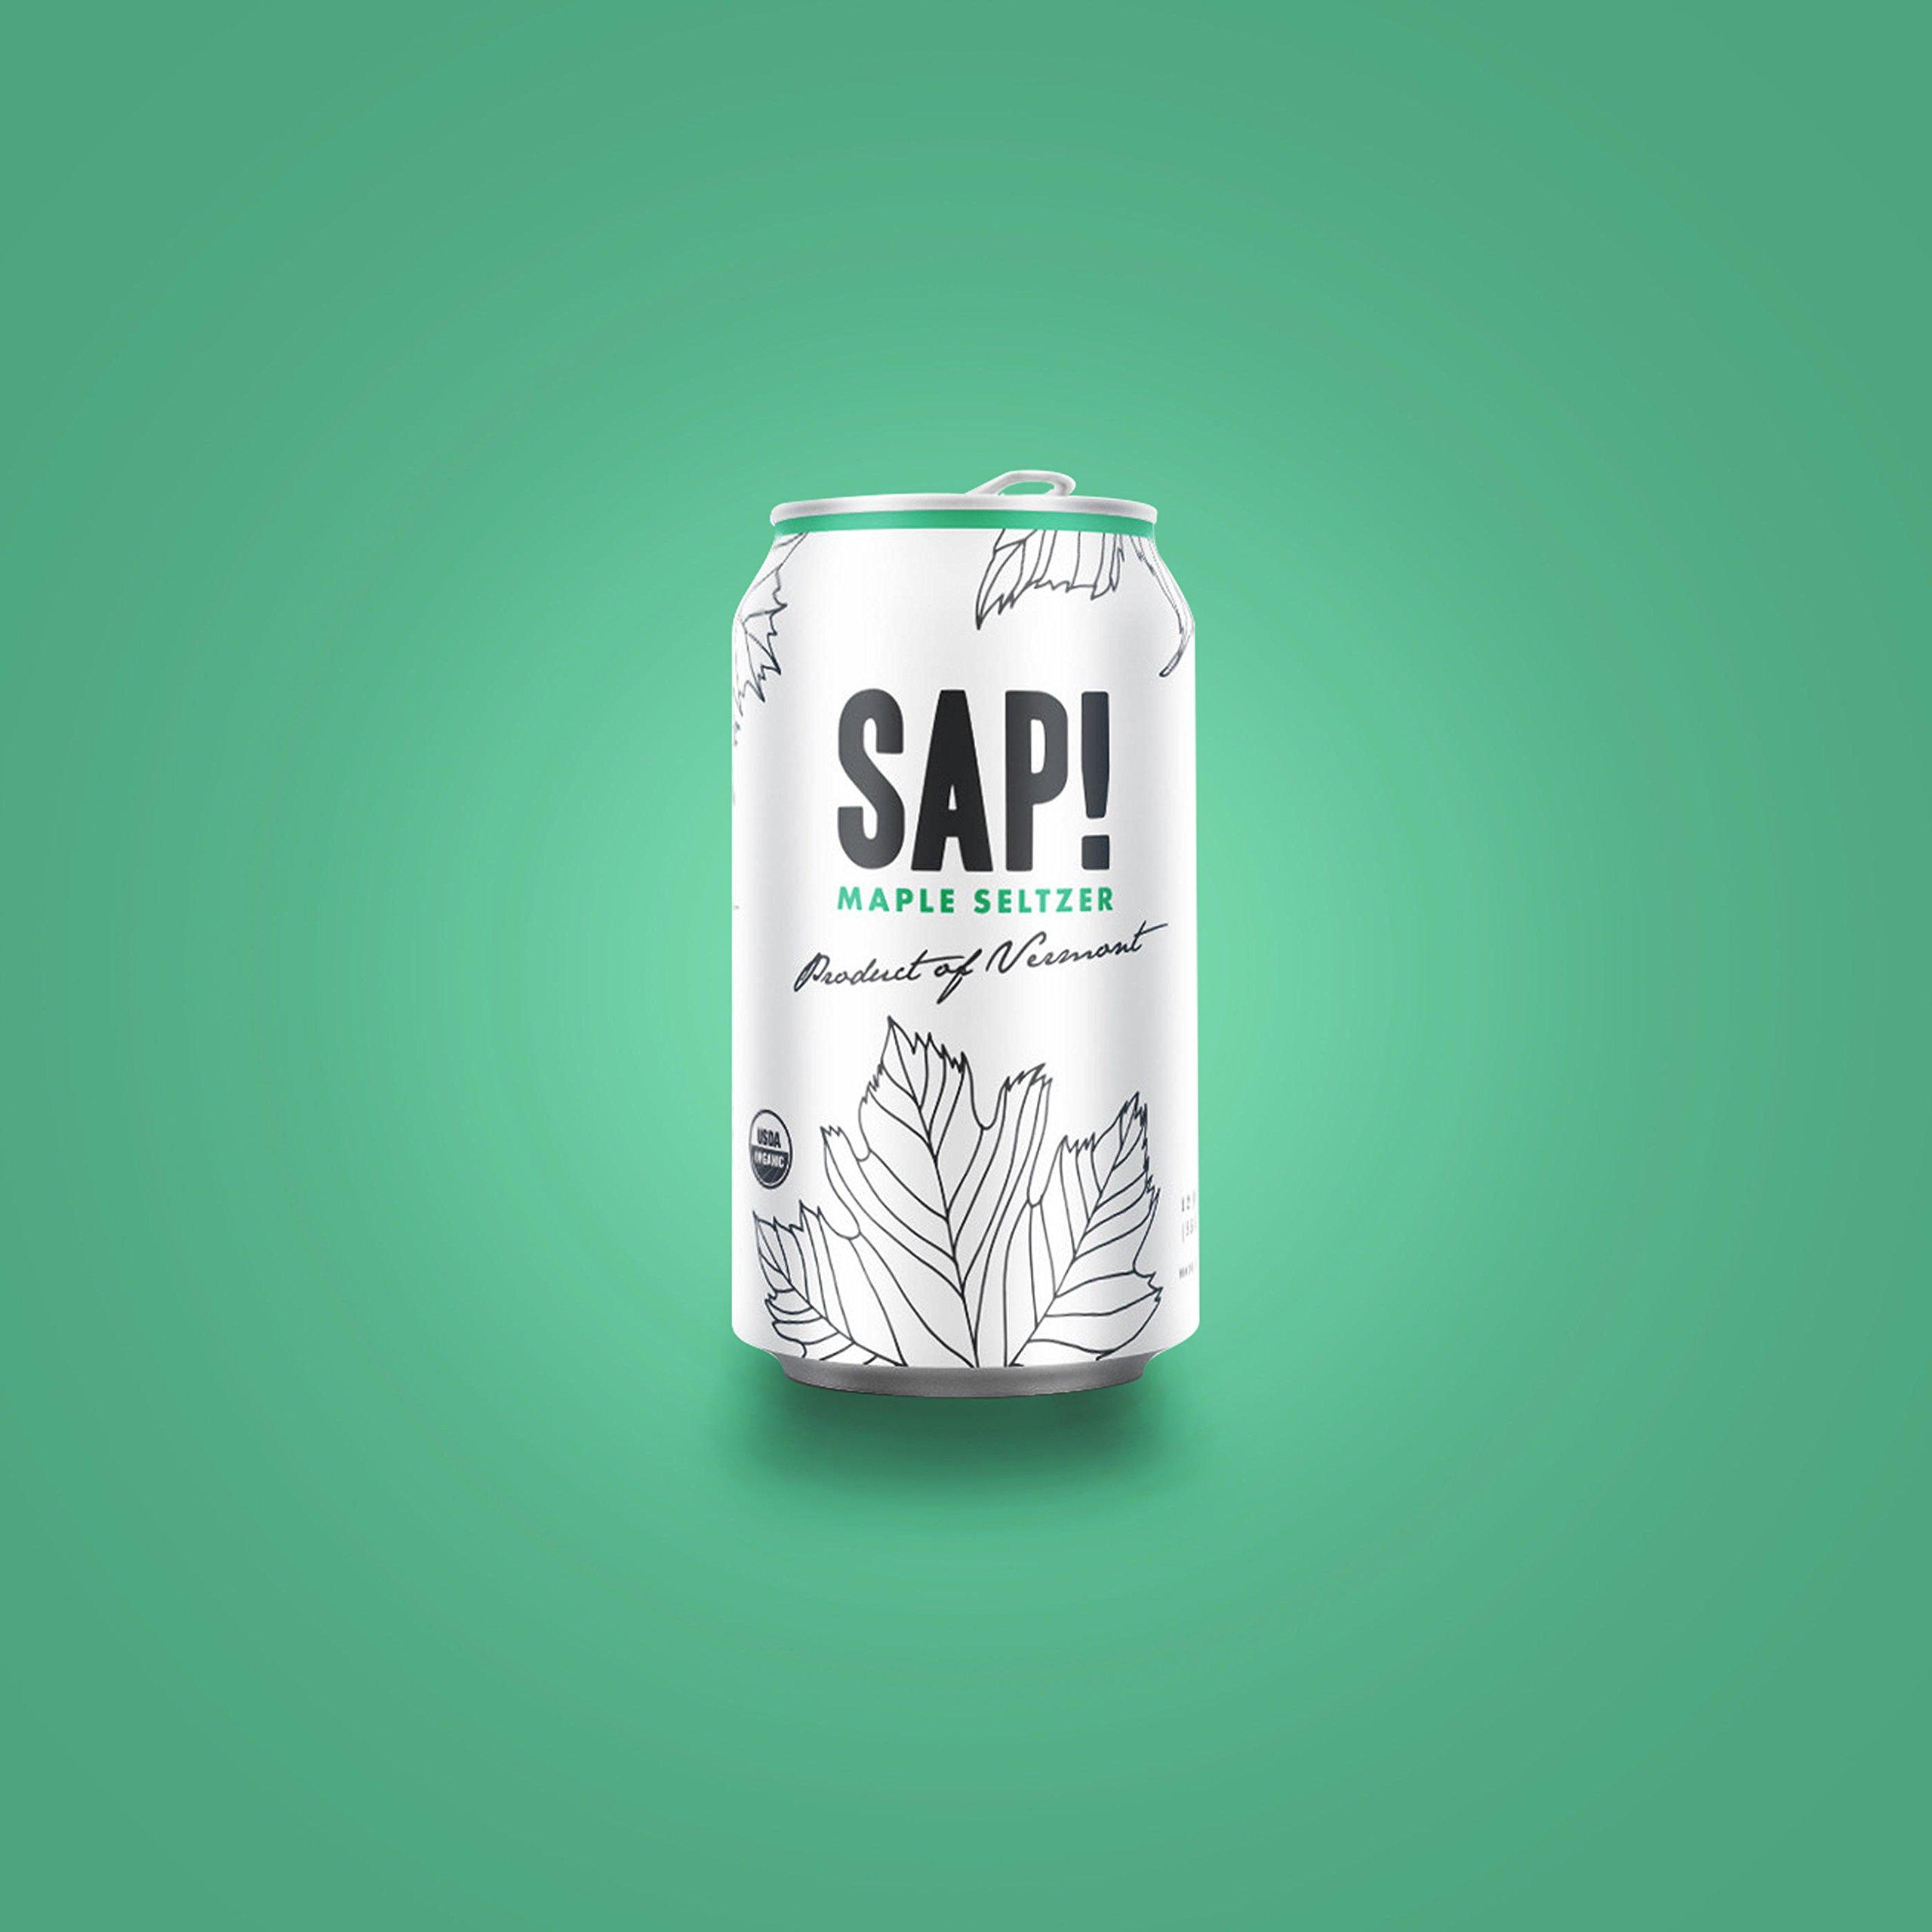 Amazon.com : Sap! Maple Seltzer Water - Case of 24 - USDA Organic ...